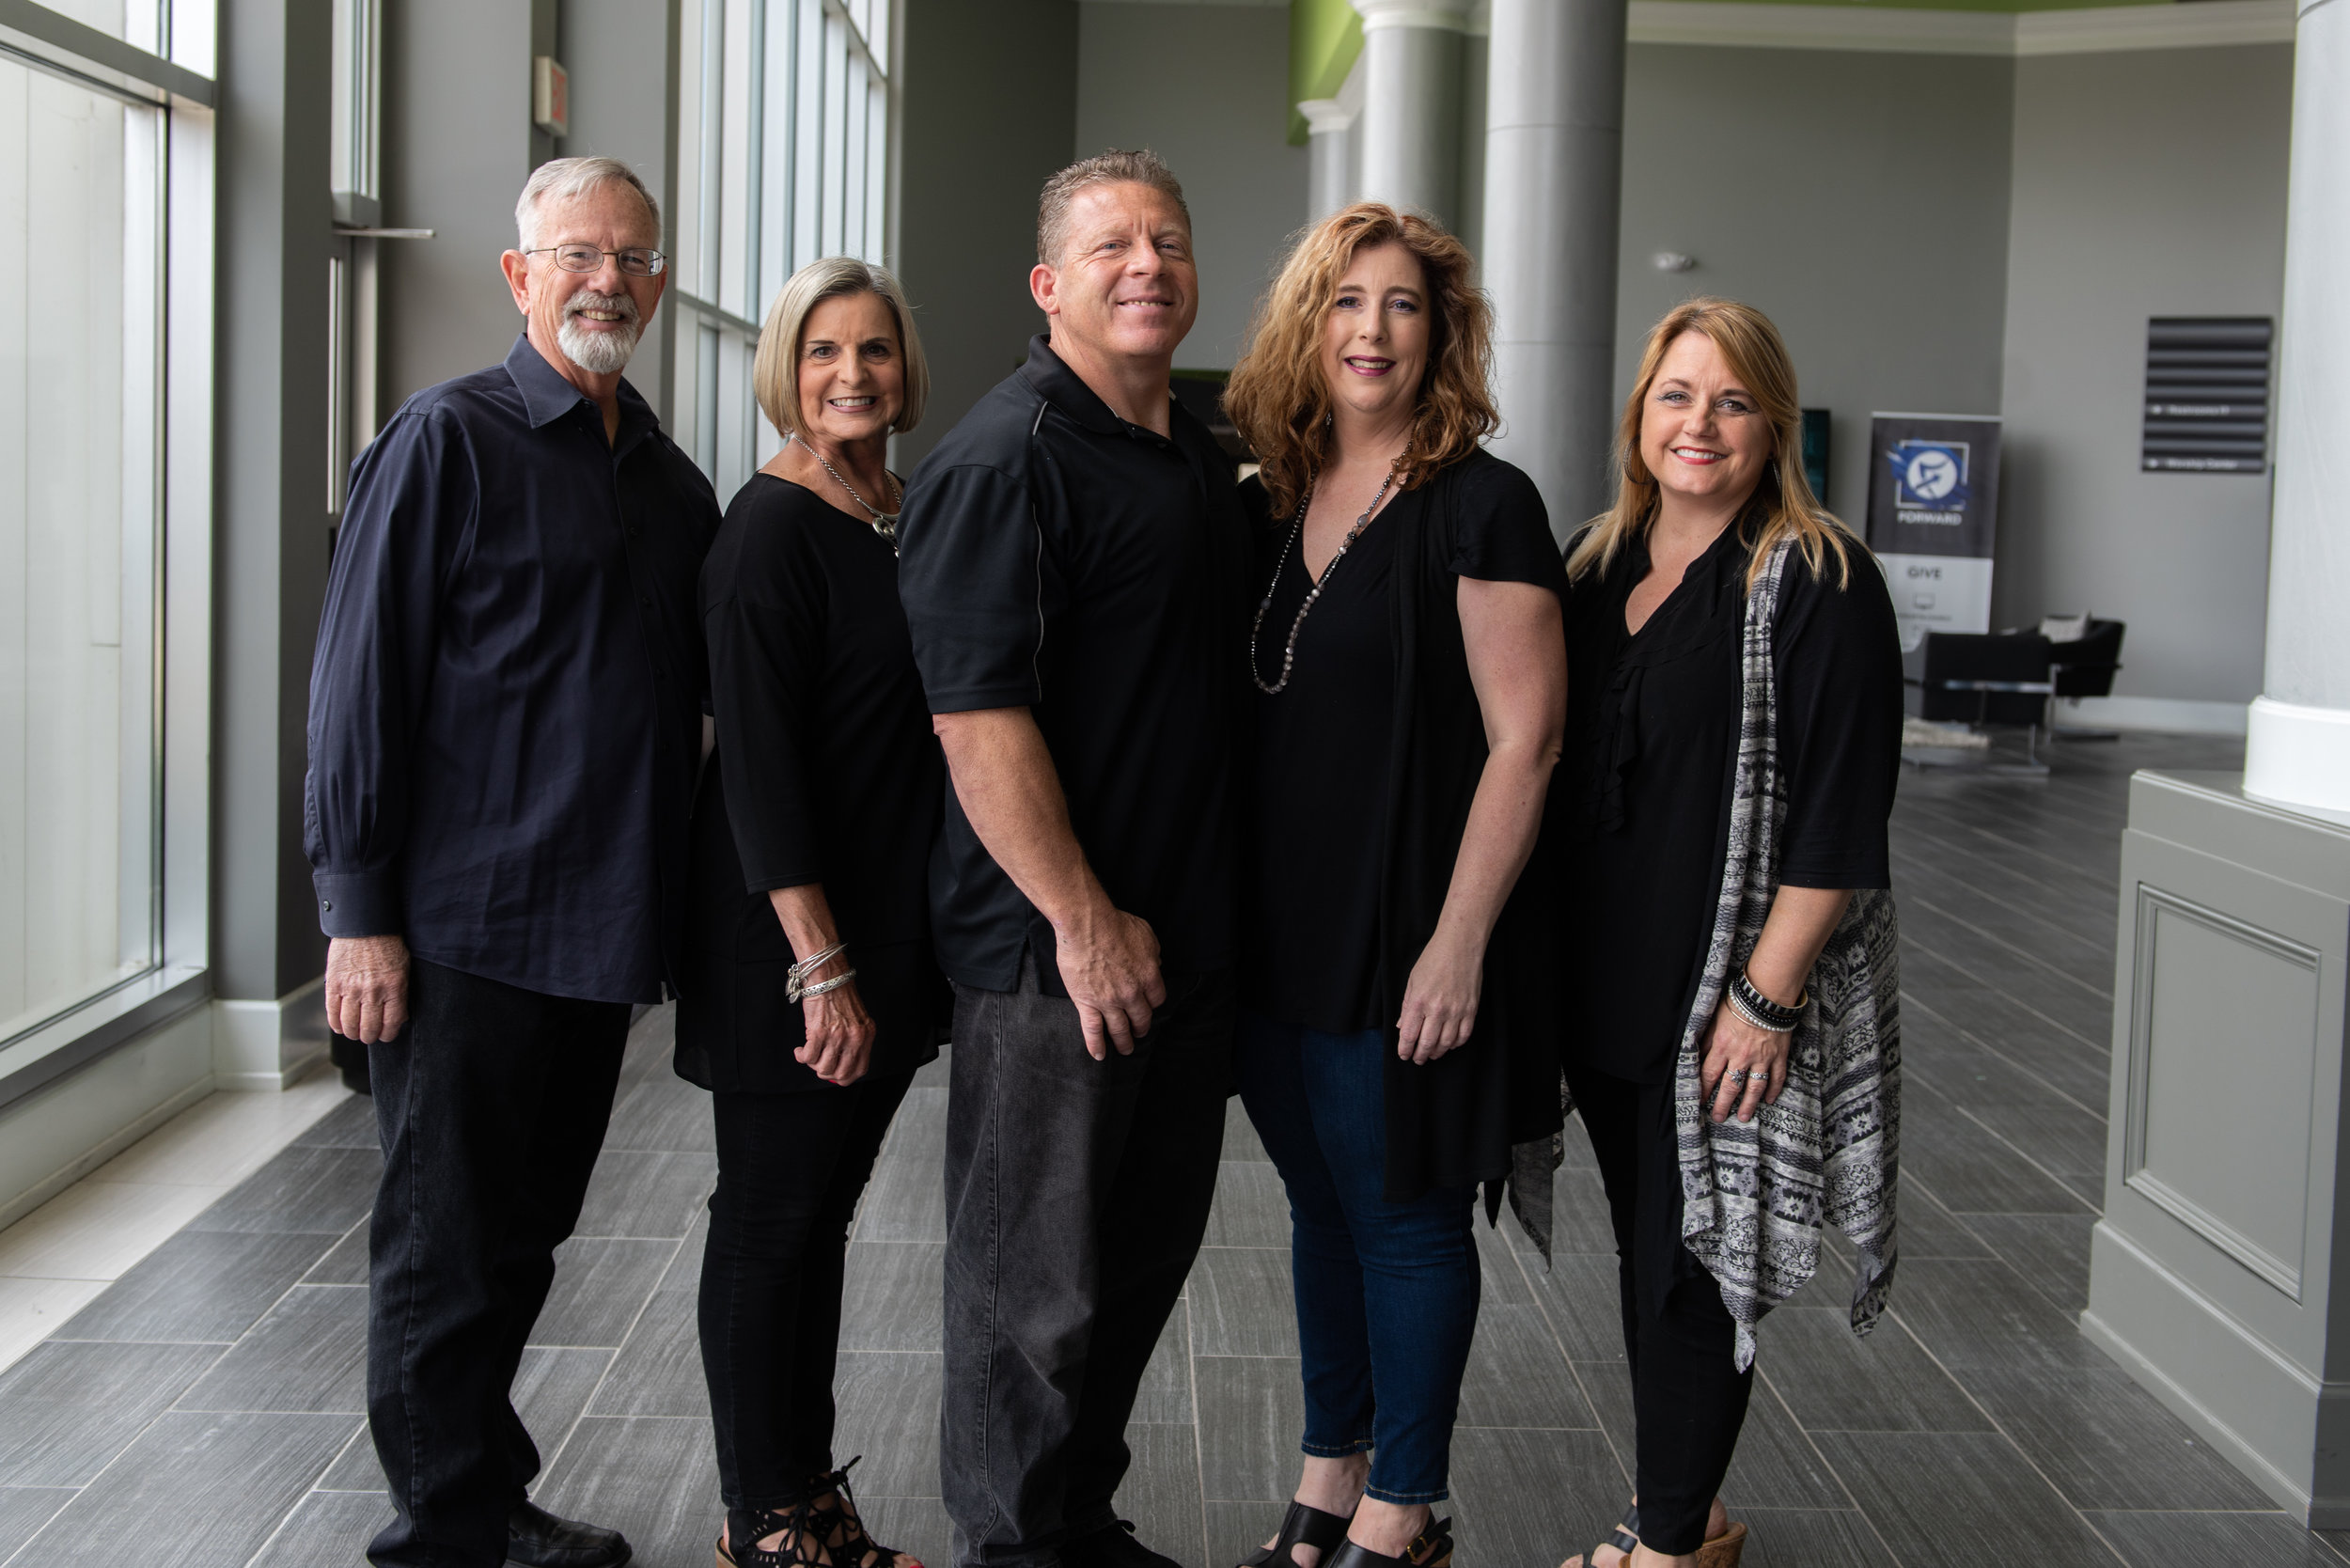 Lee, Marcia, Gary, Jennifer and Anna Share Team